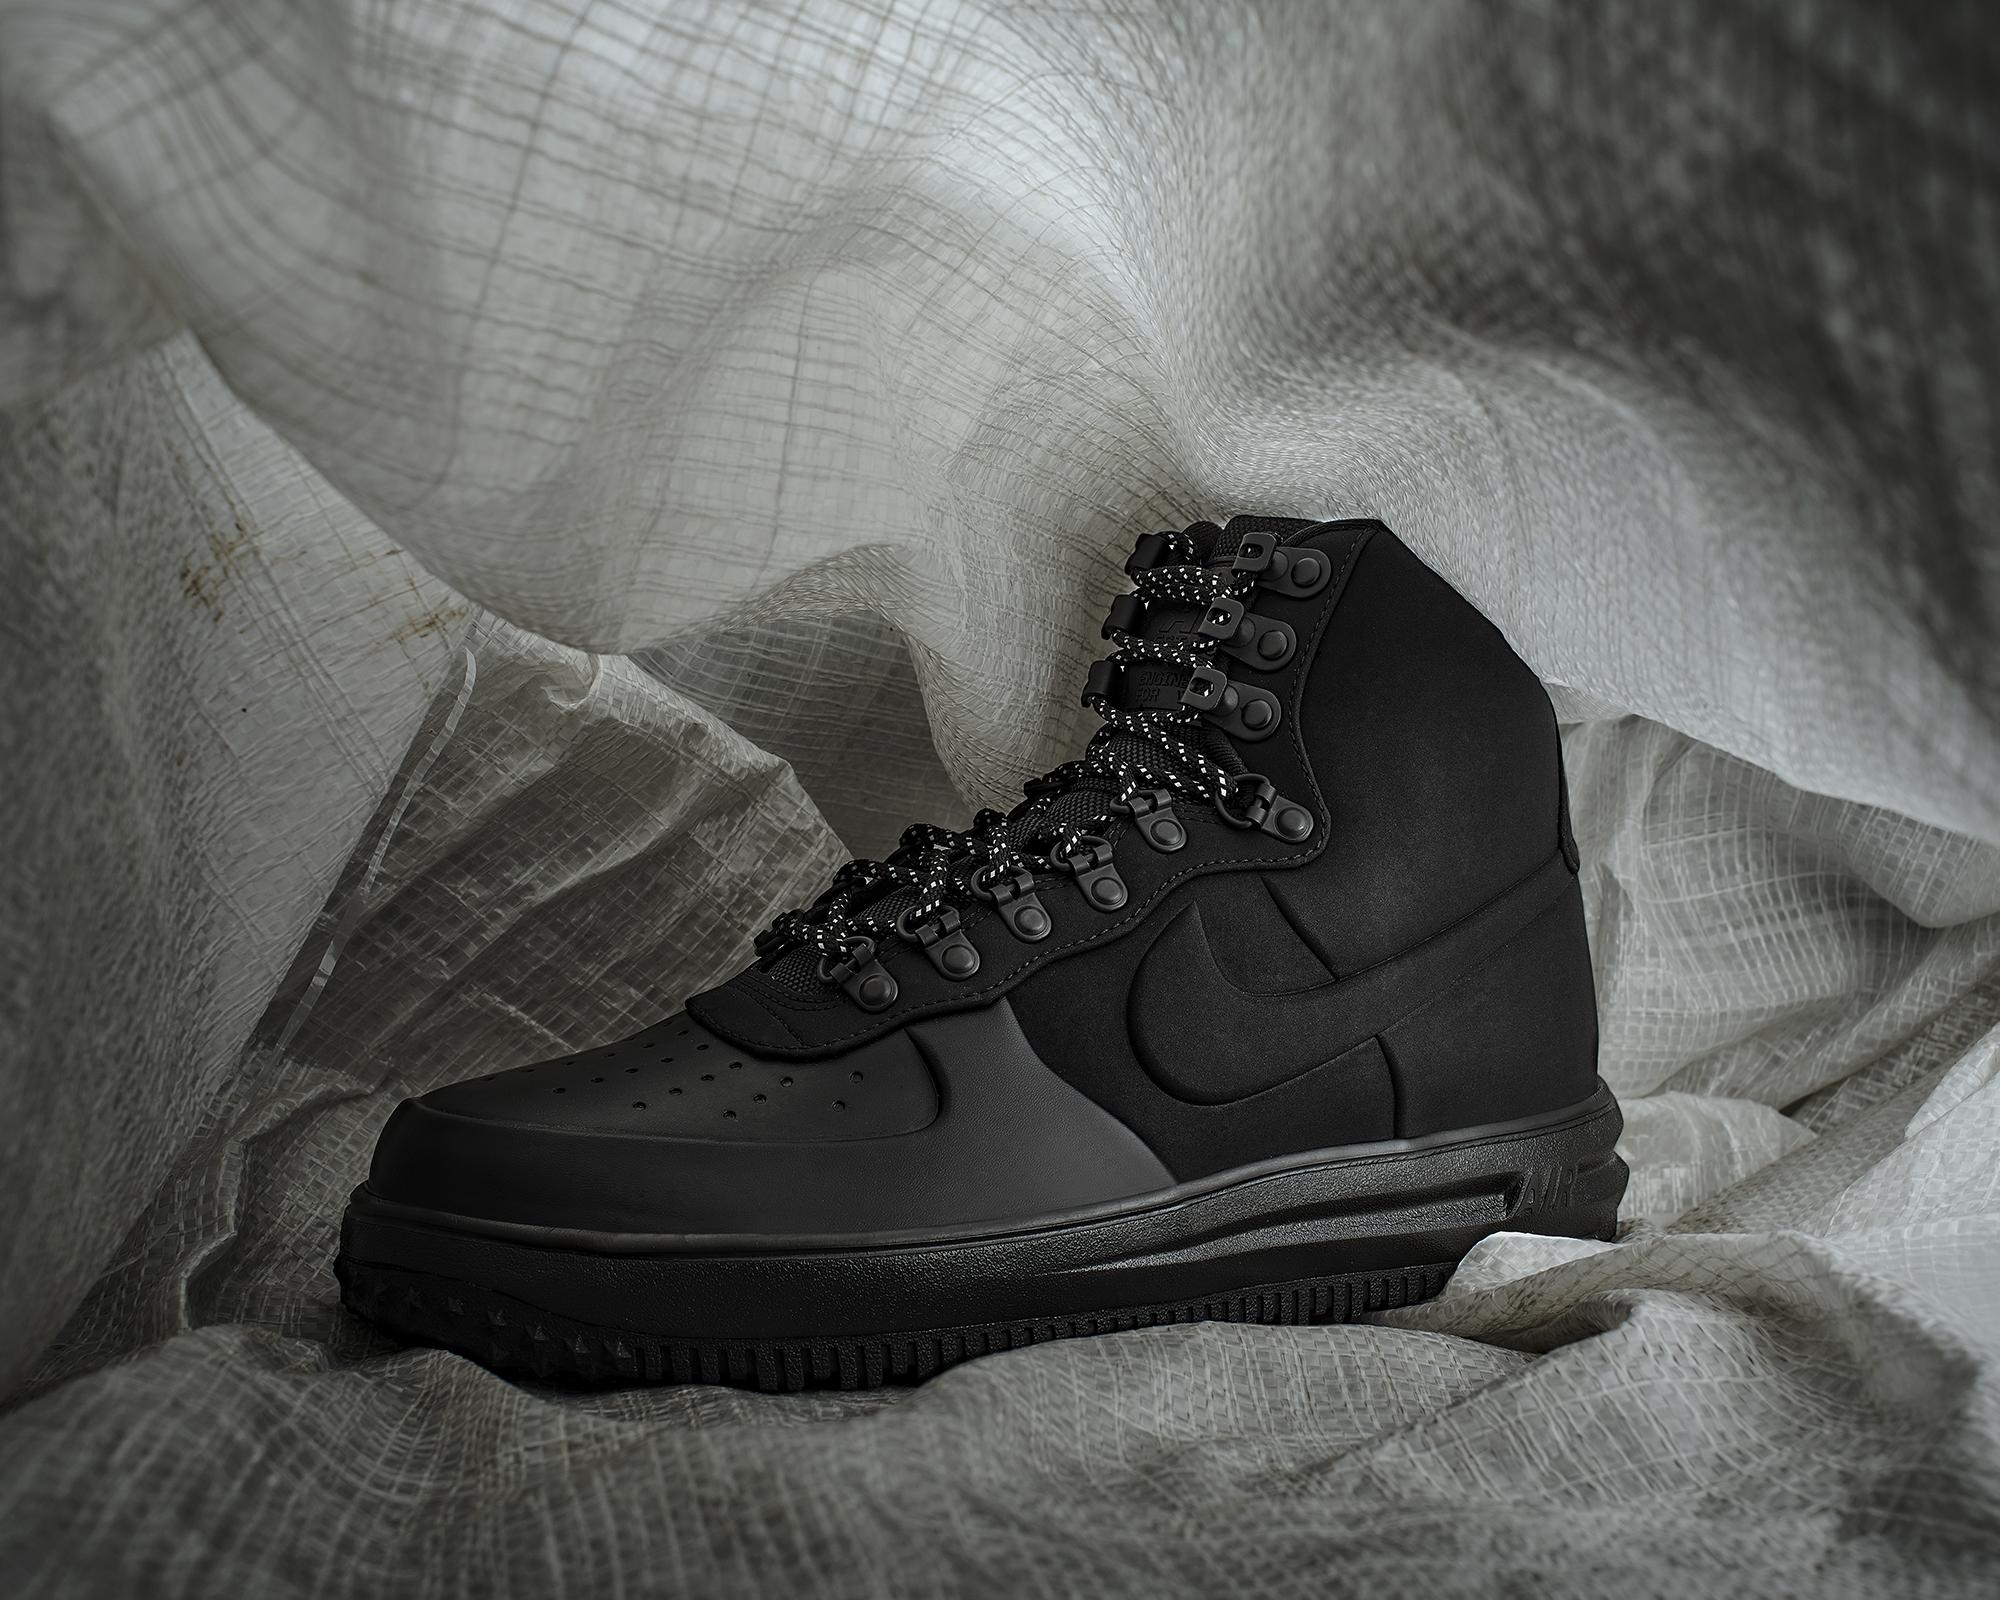 052019_Nike_DuckBoot_0620.jpg